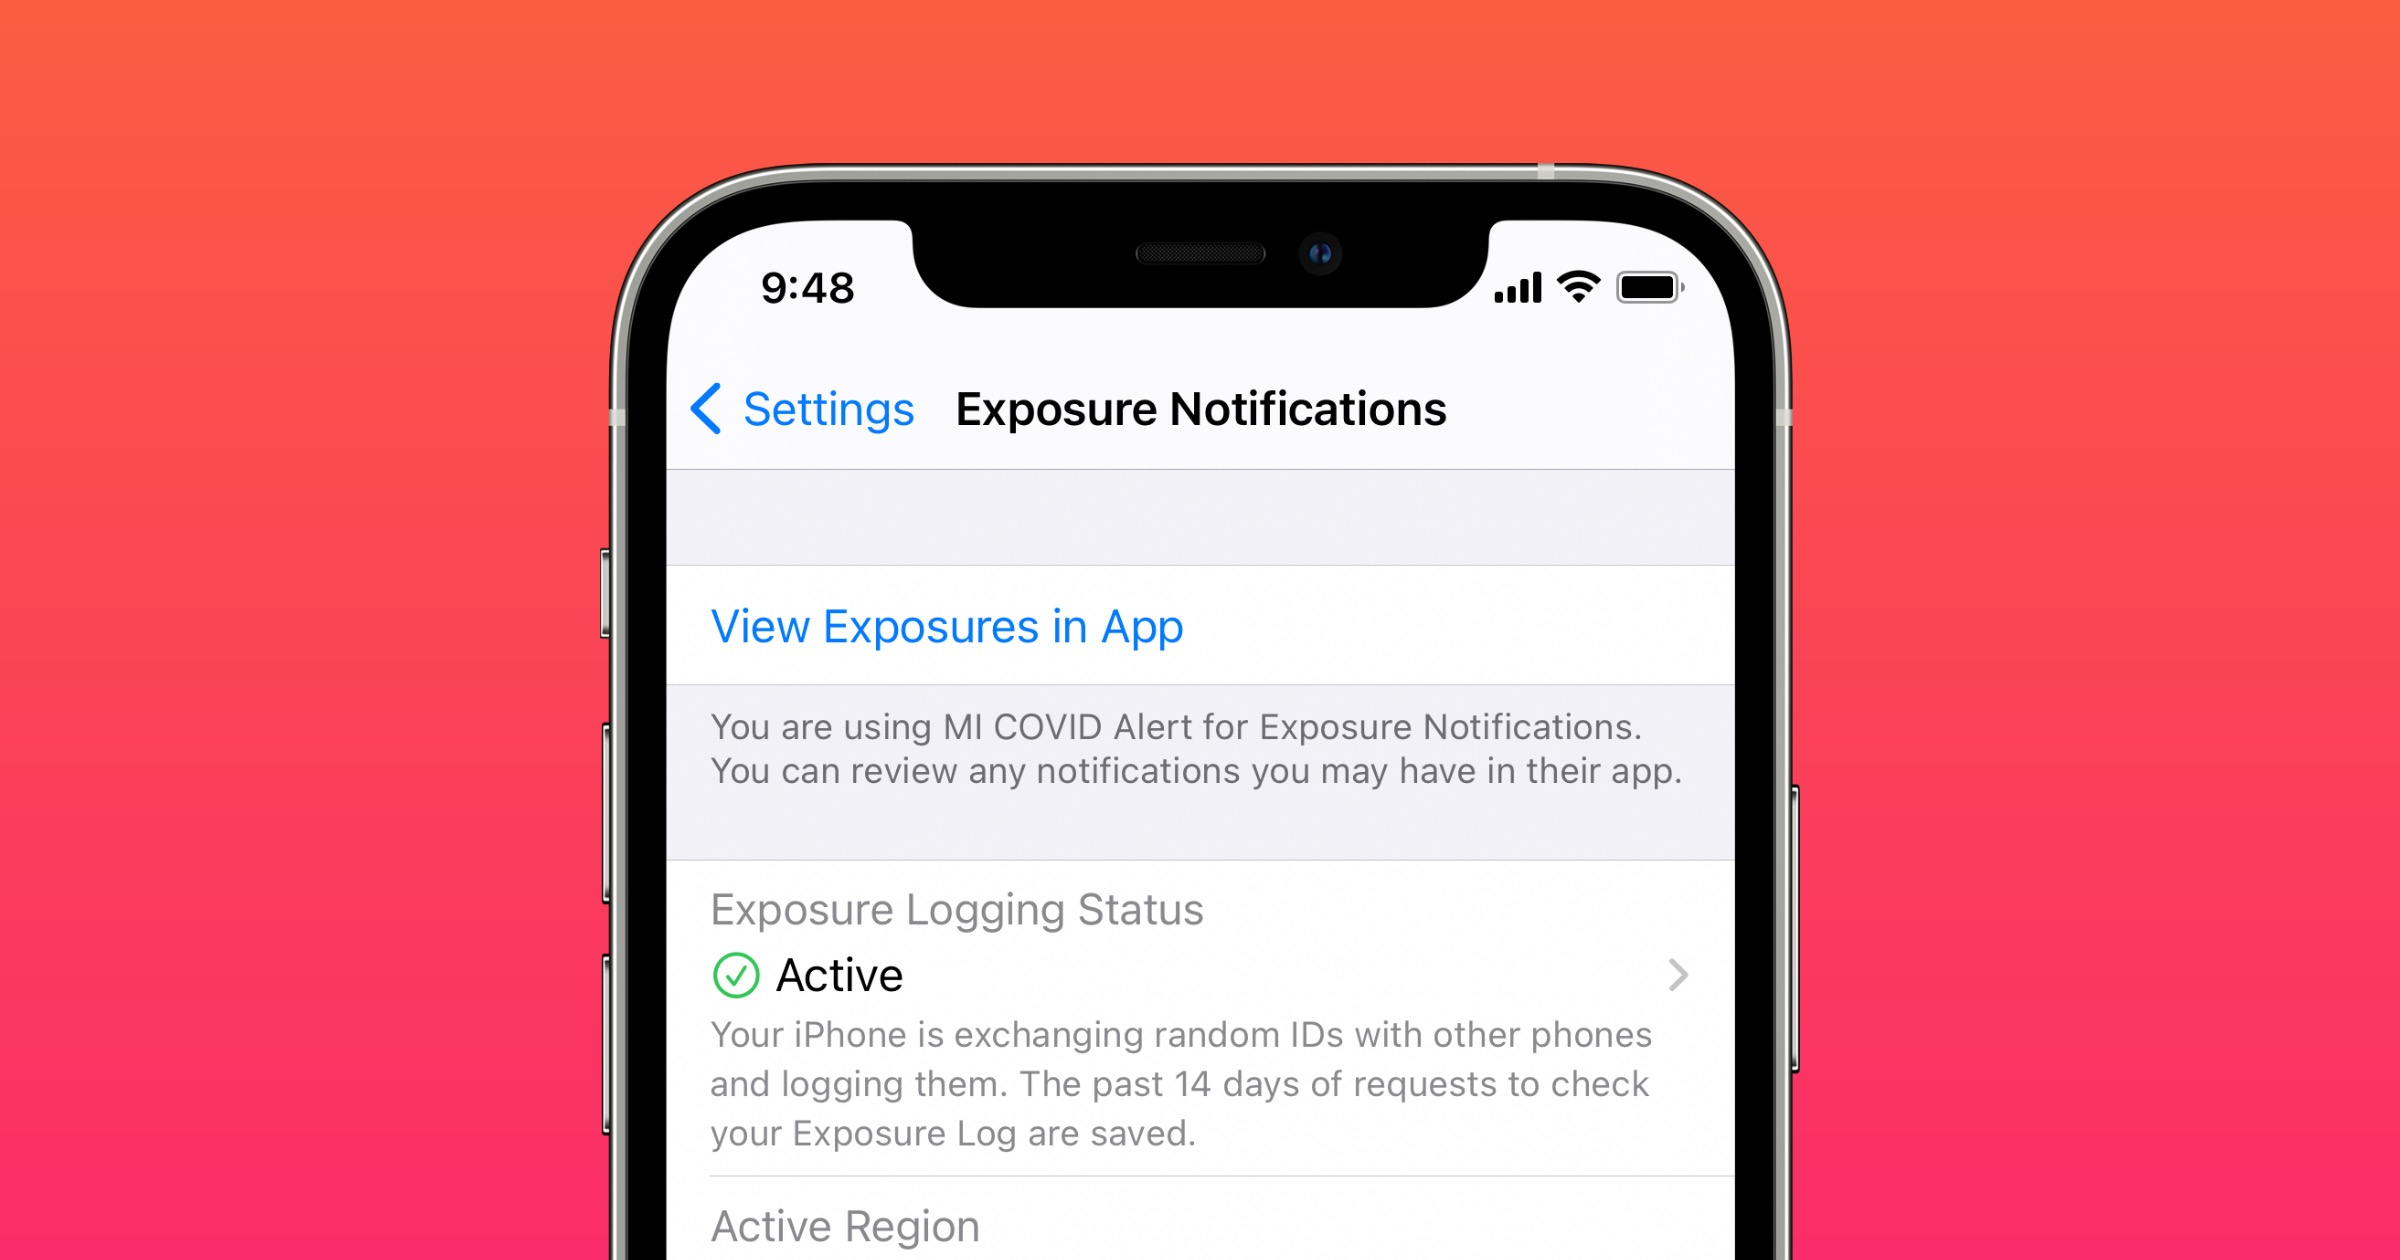 Exposure notifications on iPhone